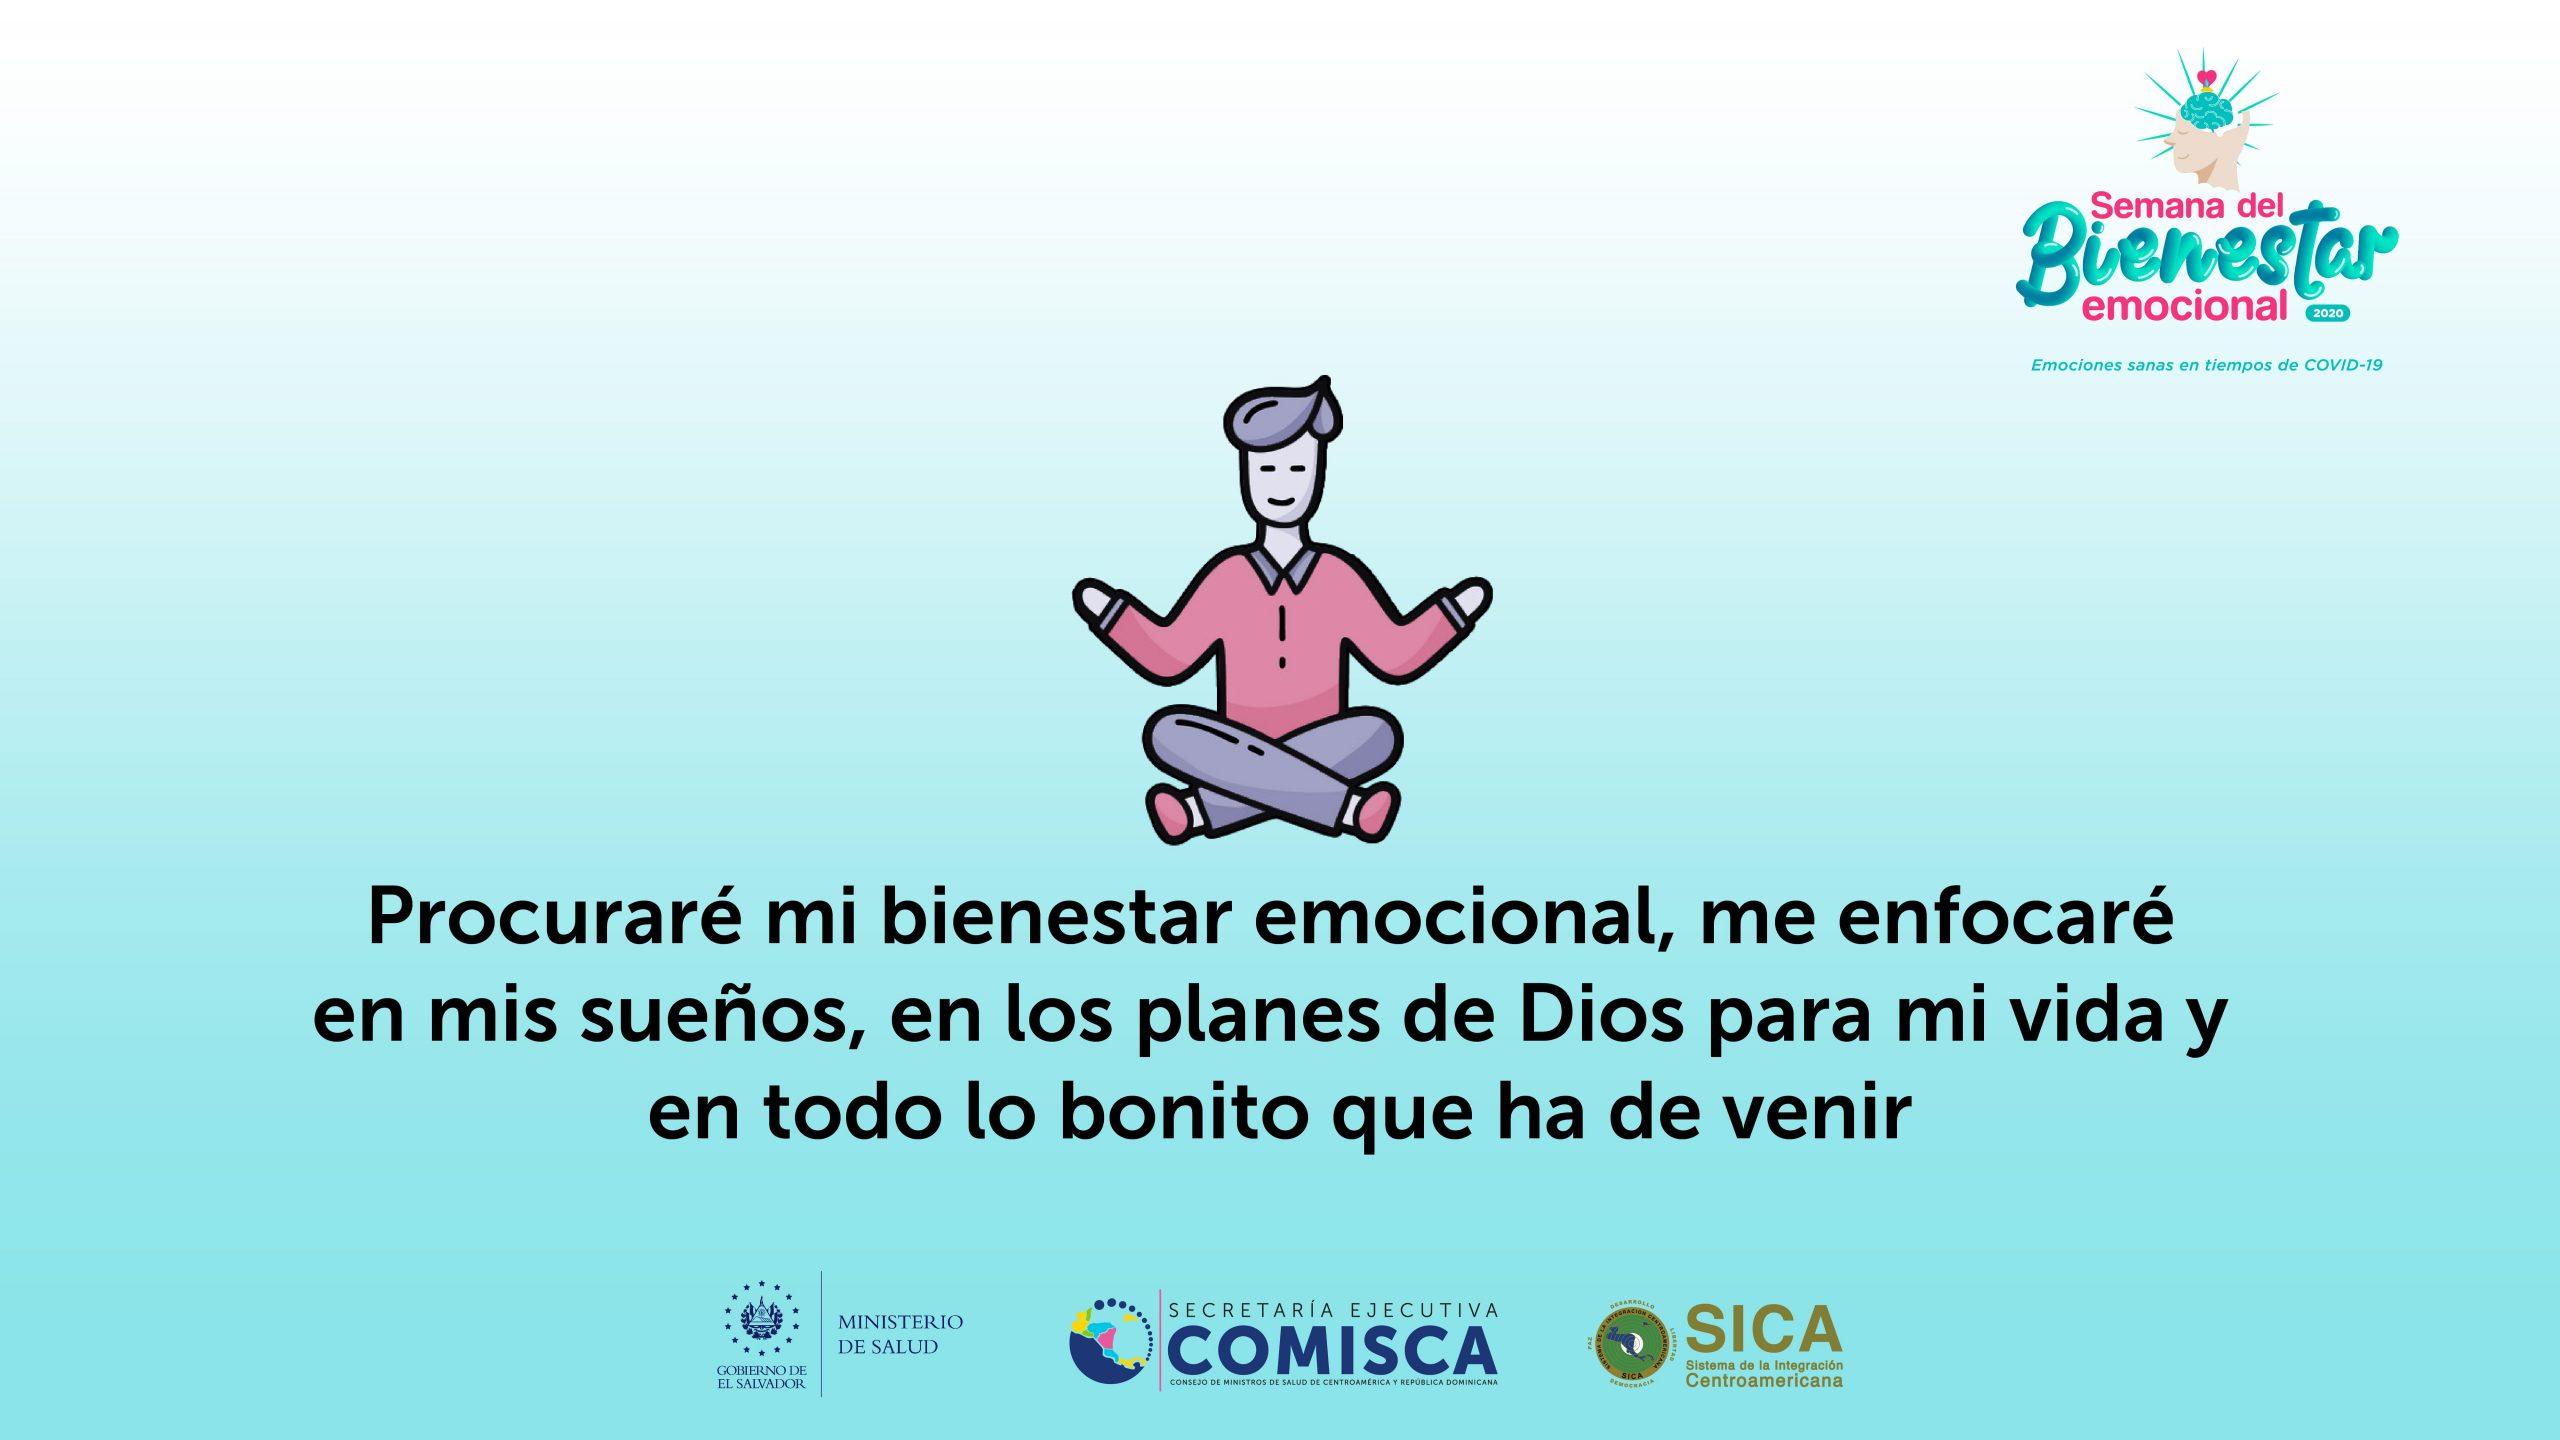 semana-del-bienestar-emocional2020-mensaje3-min